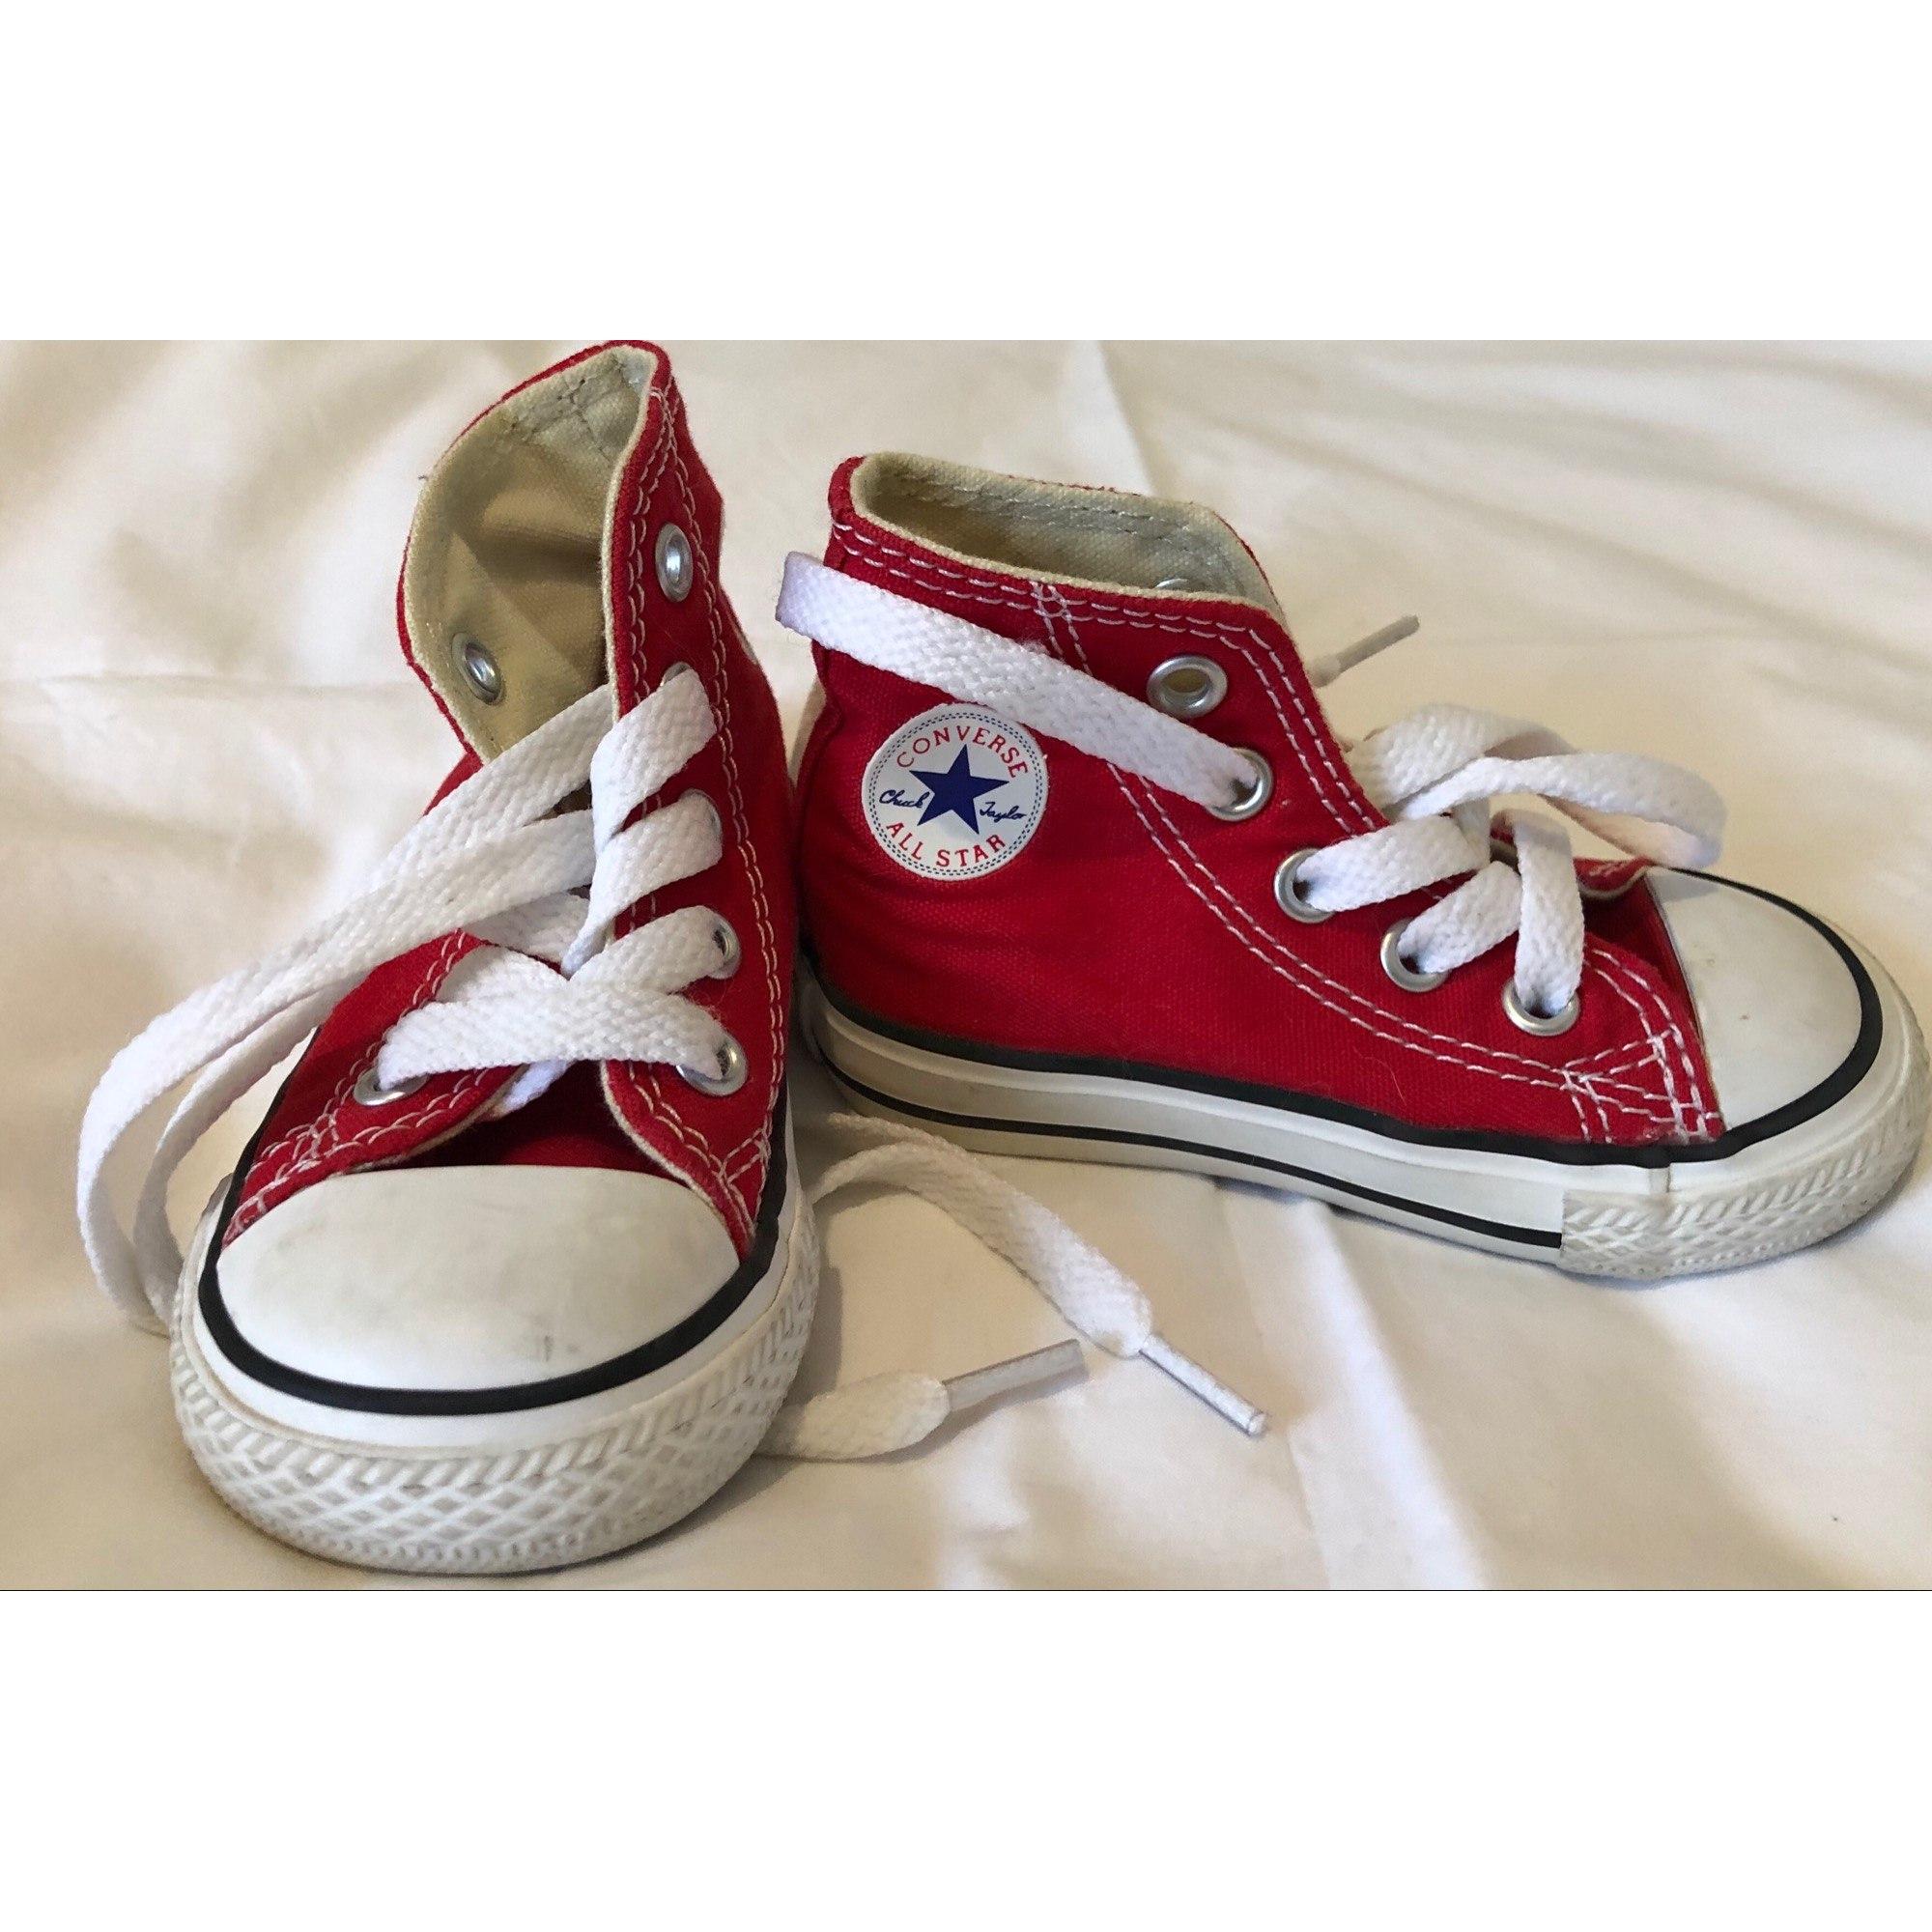 Sneakers CONVERSE Red, burgundy